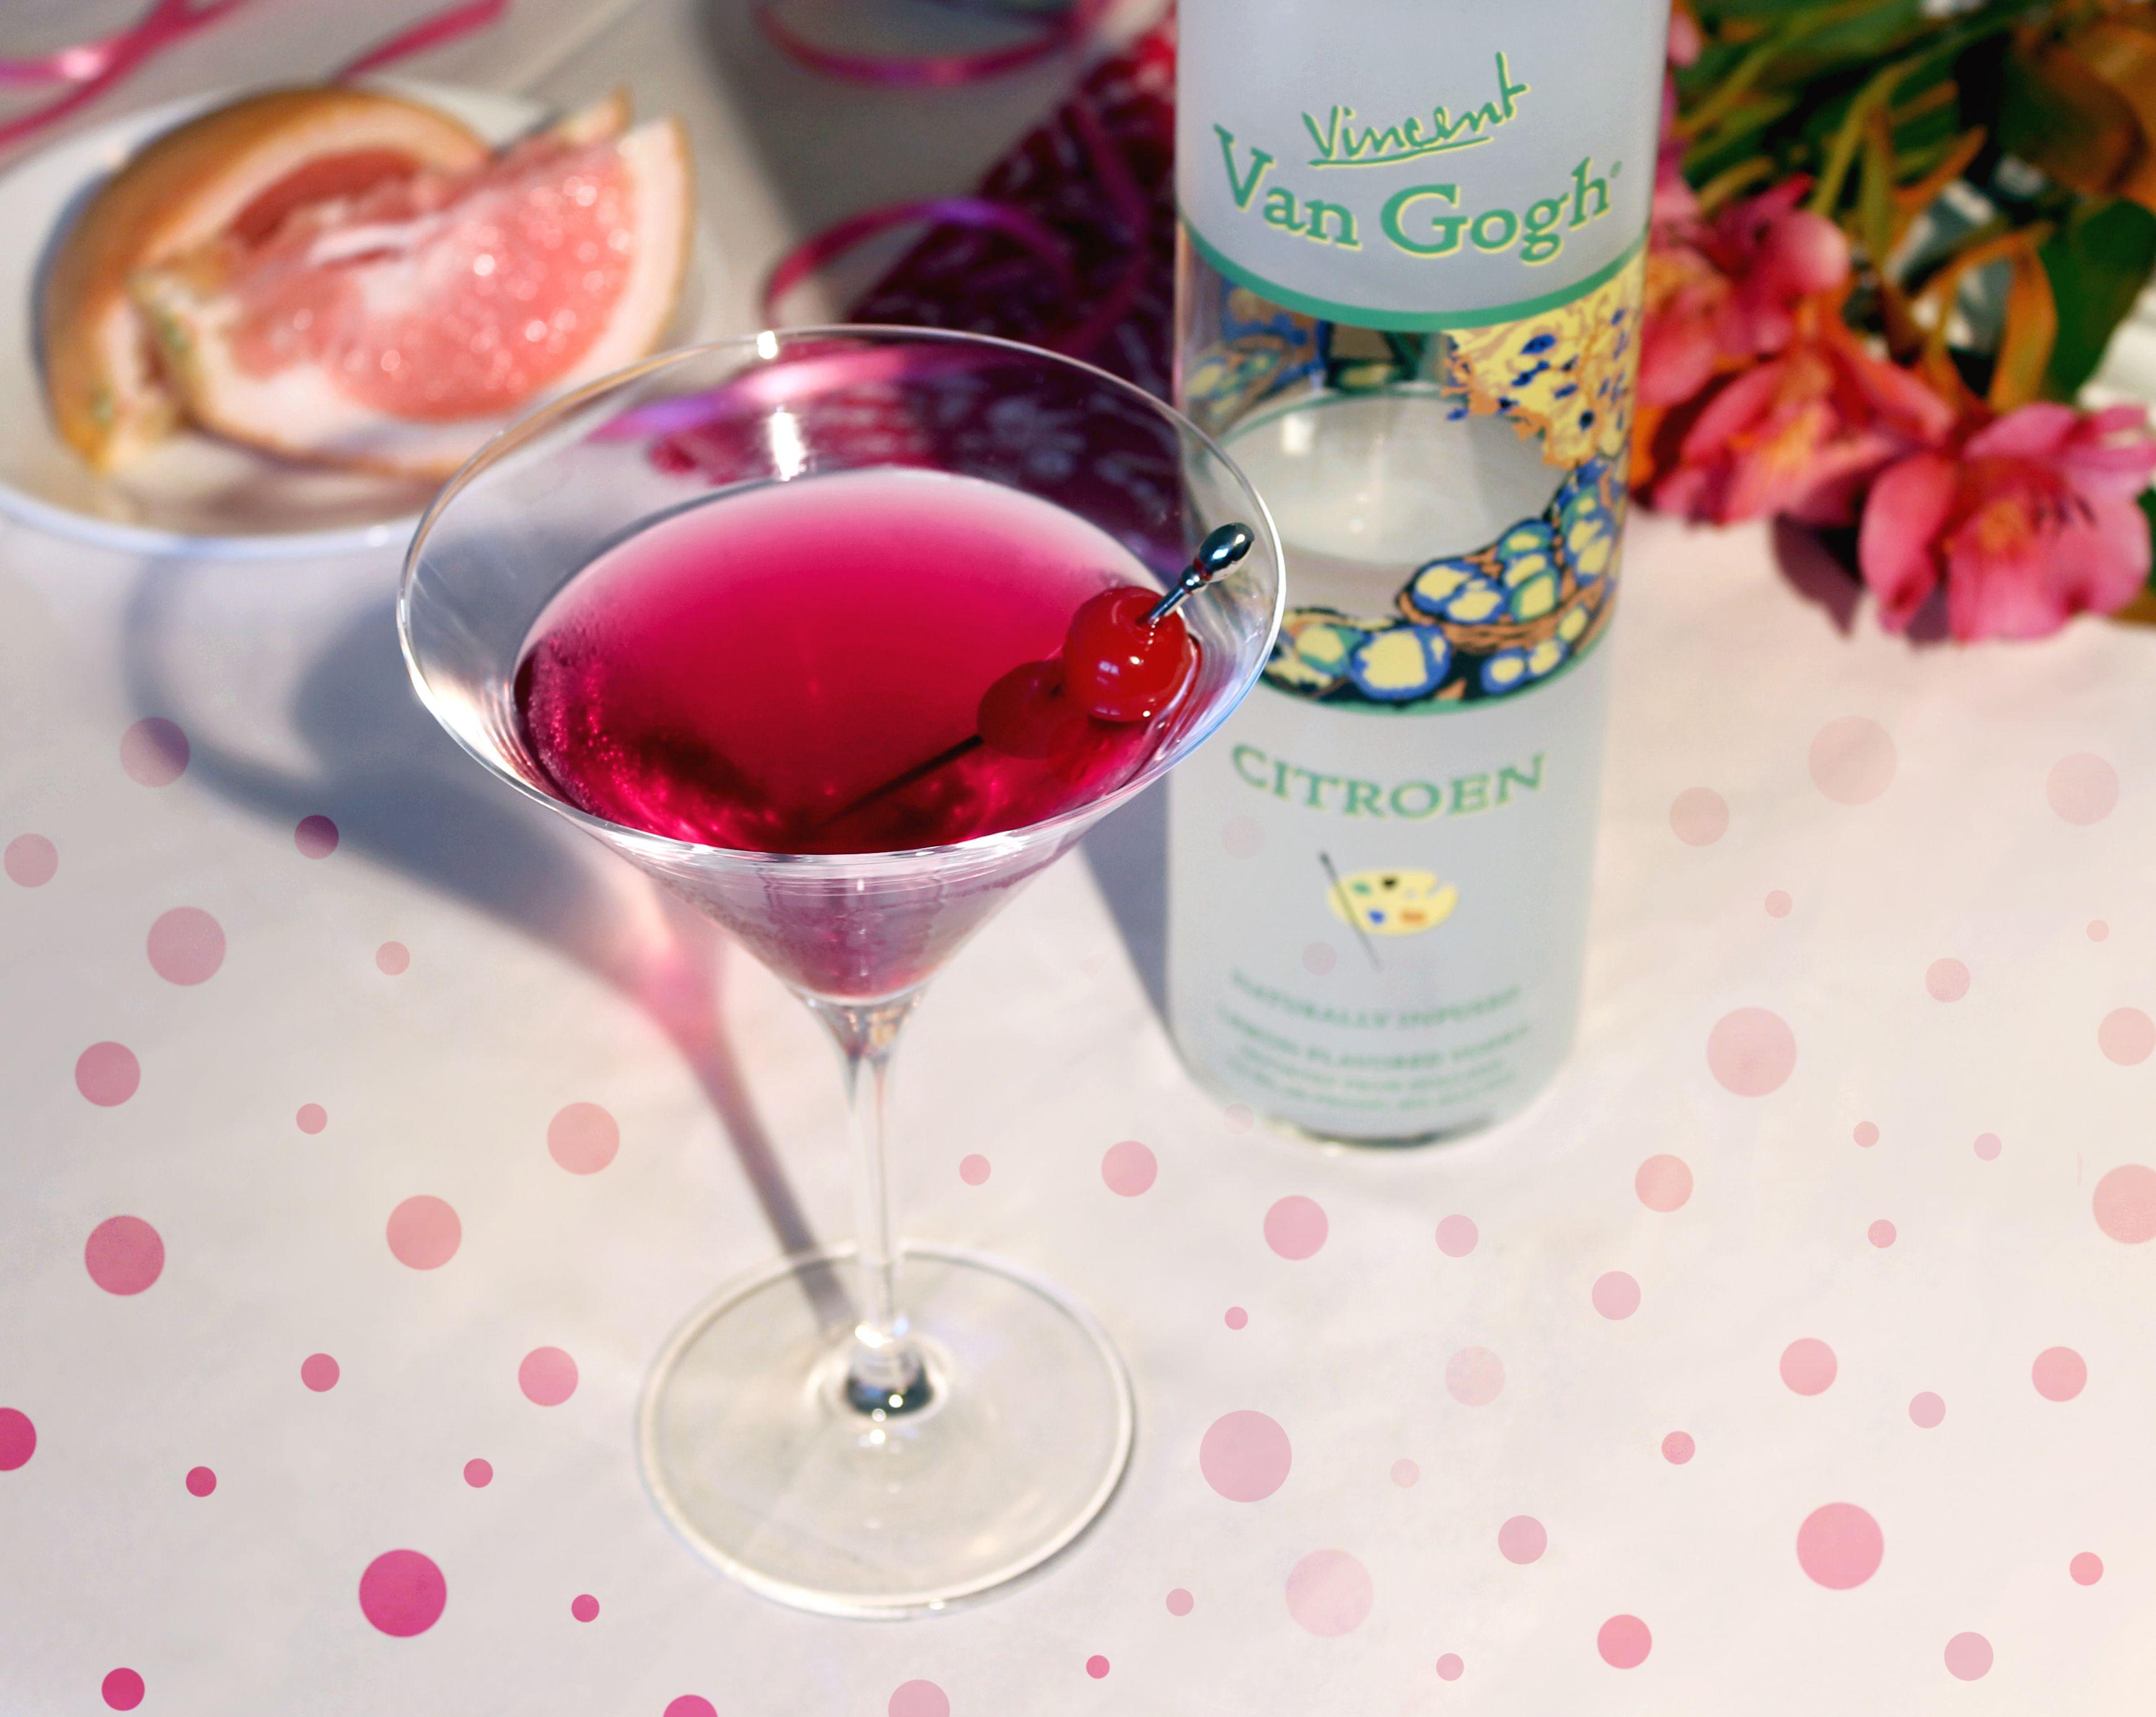 The Pink Lady 2 Oz Van Gogh Citroen Vodka 2 Oz Pomegranate Juice 1 Grapefruit Wedge In A Shaker Combine Vodka Pomegr Pomegranate Juice Wine Bottle Vodka